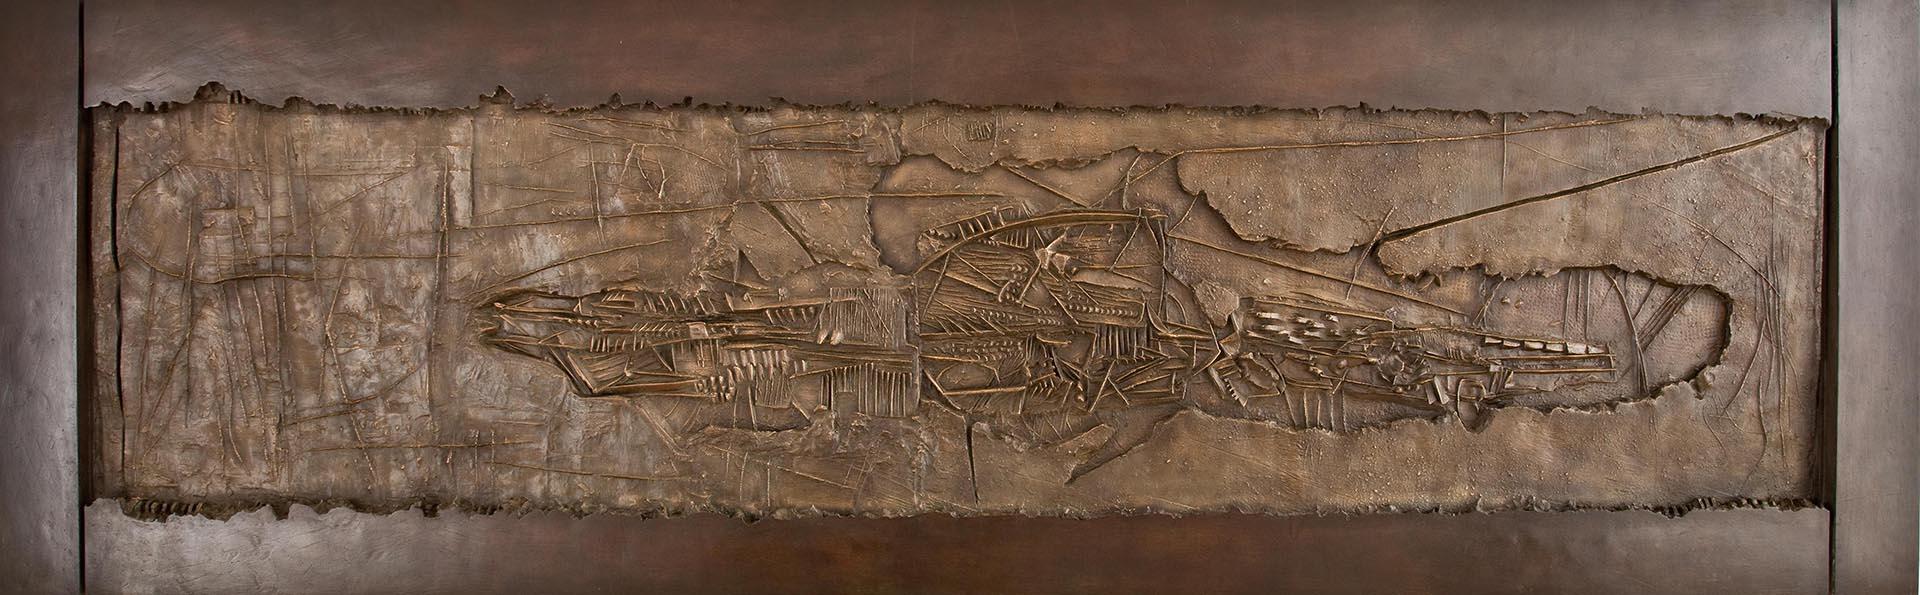 Pomodoro Giò, Ritrovamento, 1959, 124x400x9 cm